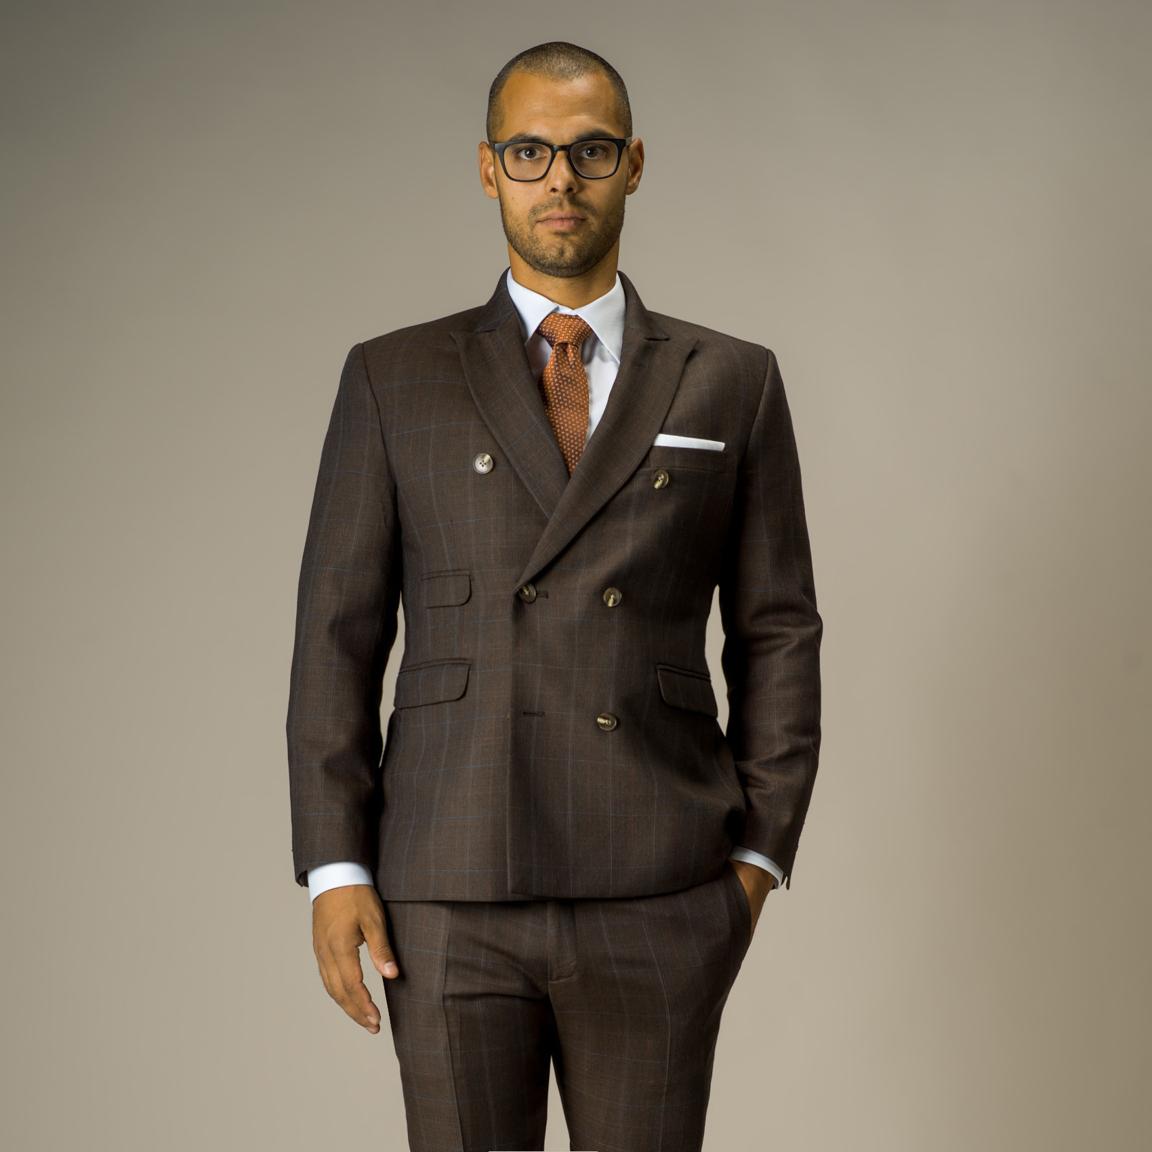 Tvådelad dubbelknäppt kostym i brun glencheck